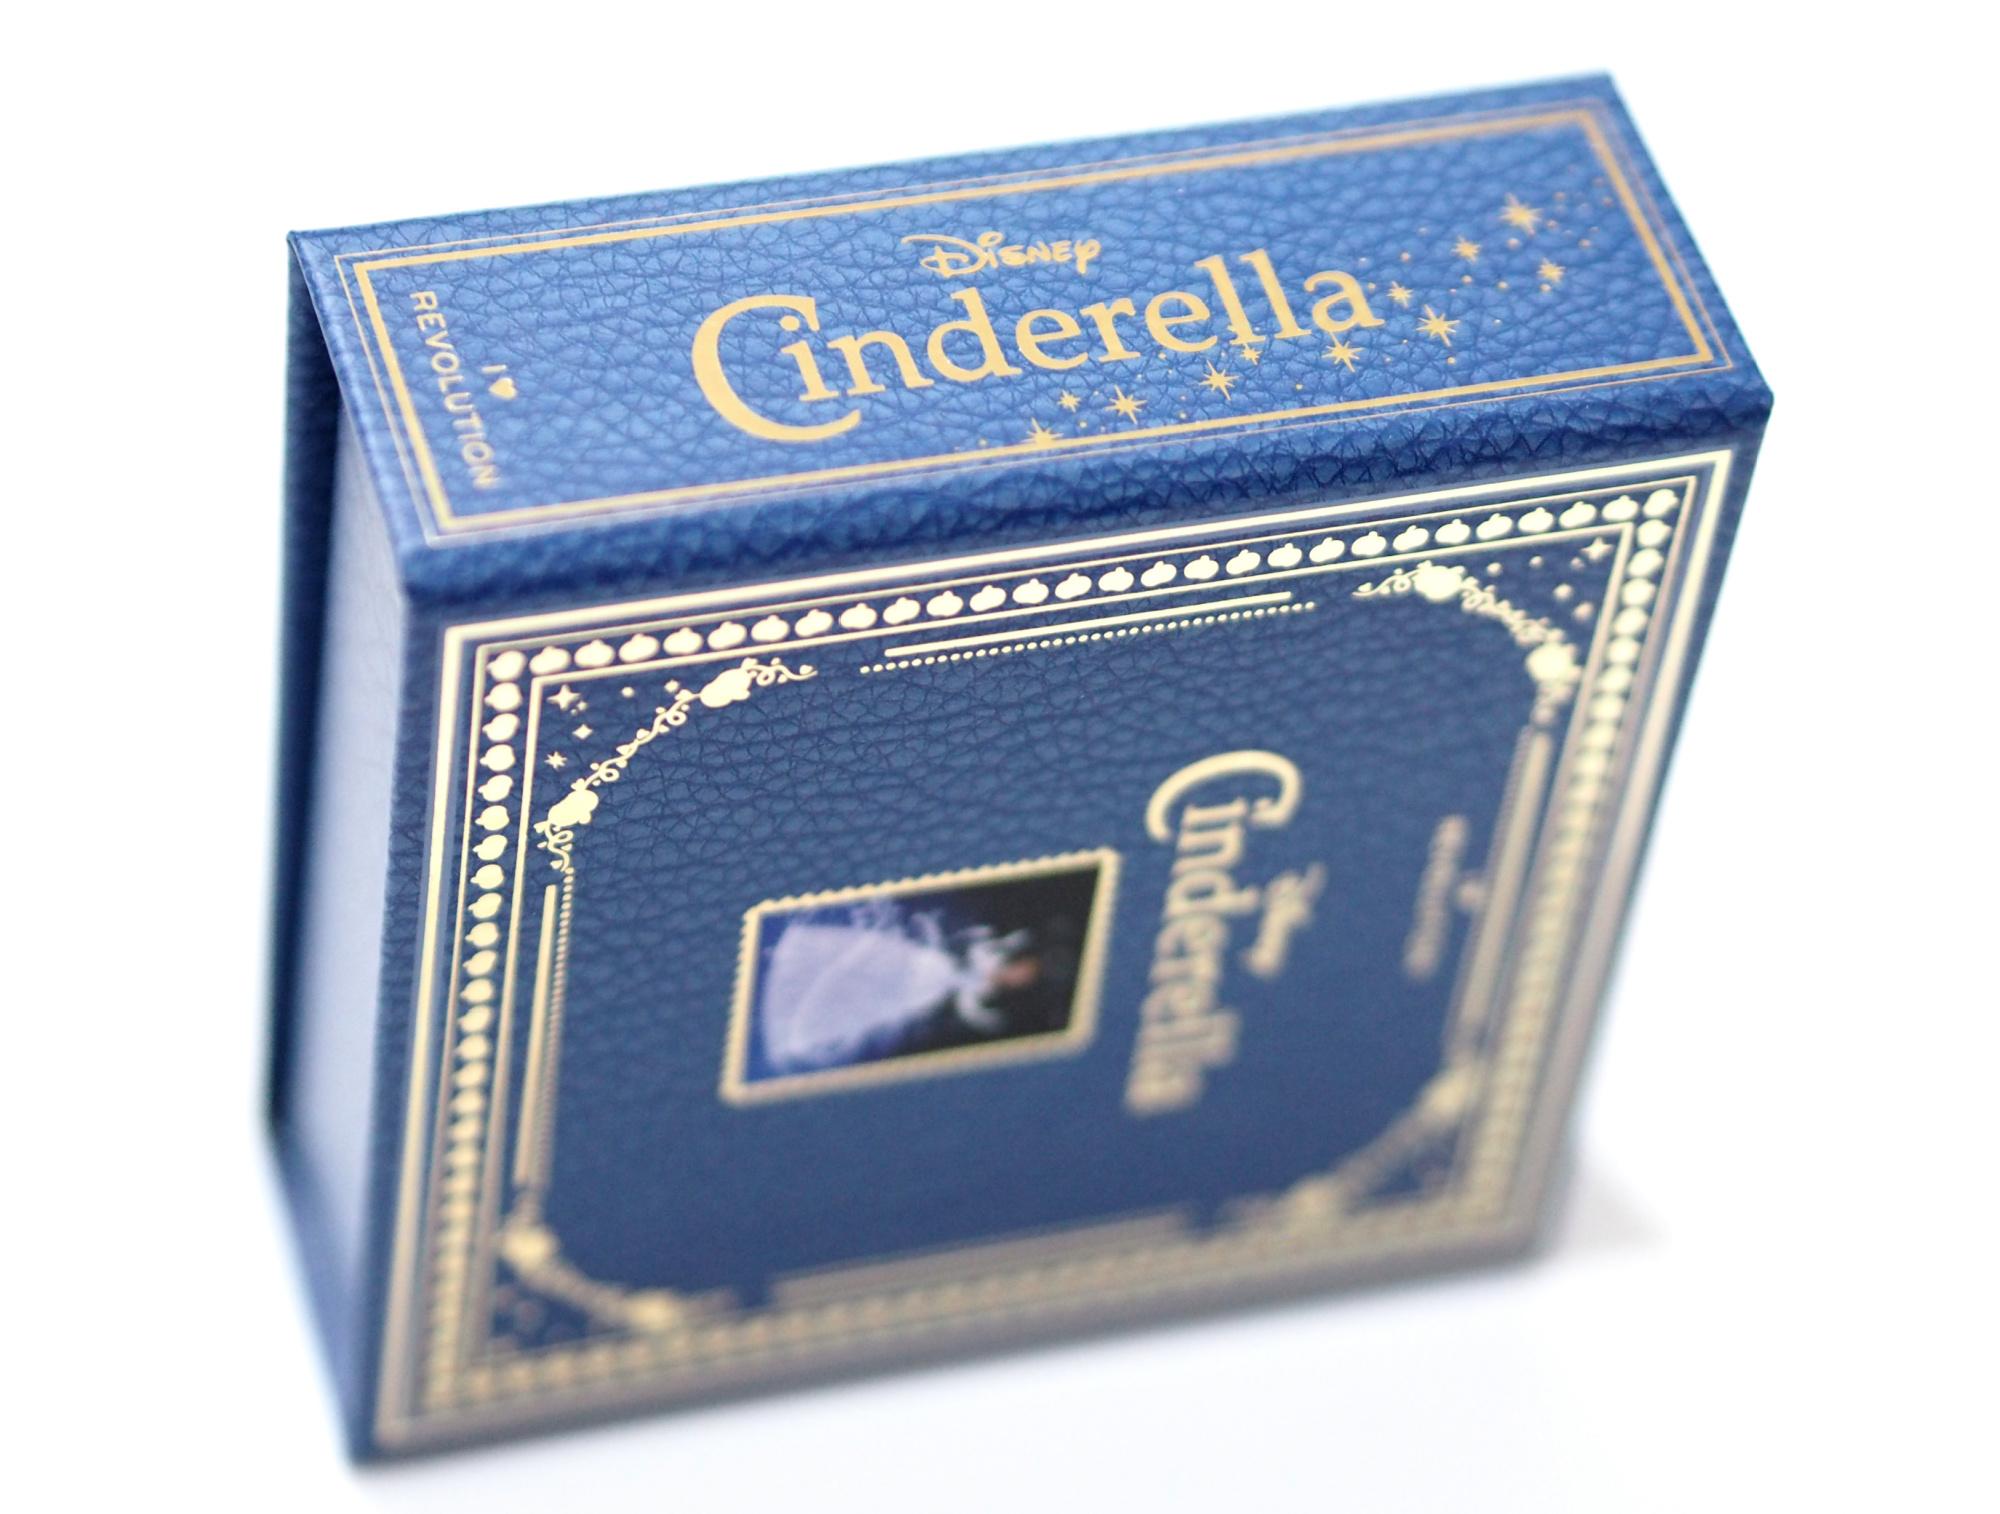 I Heart Revolution Disney Cinderella Highlighter Review Swatches